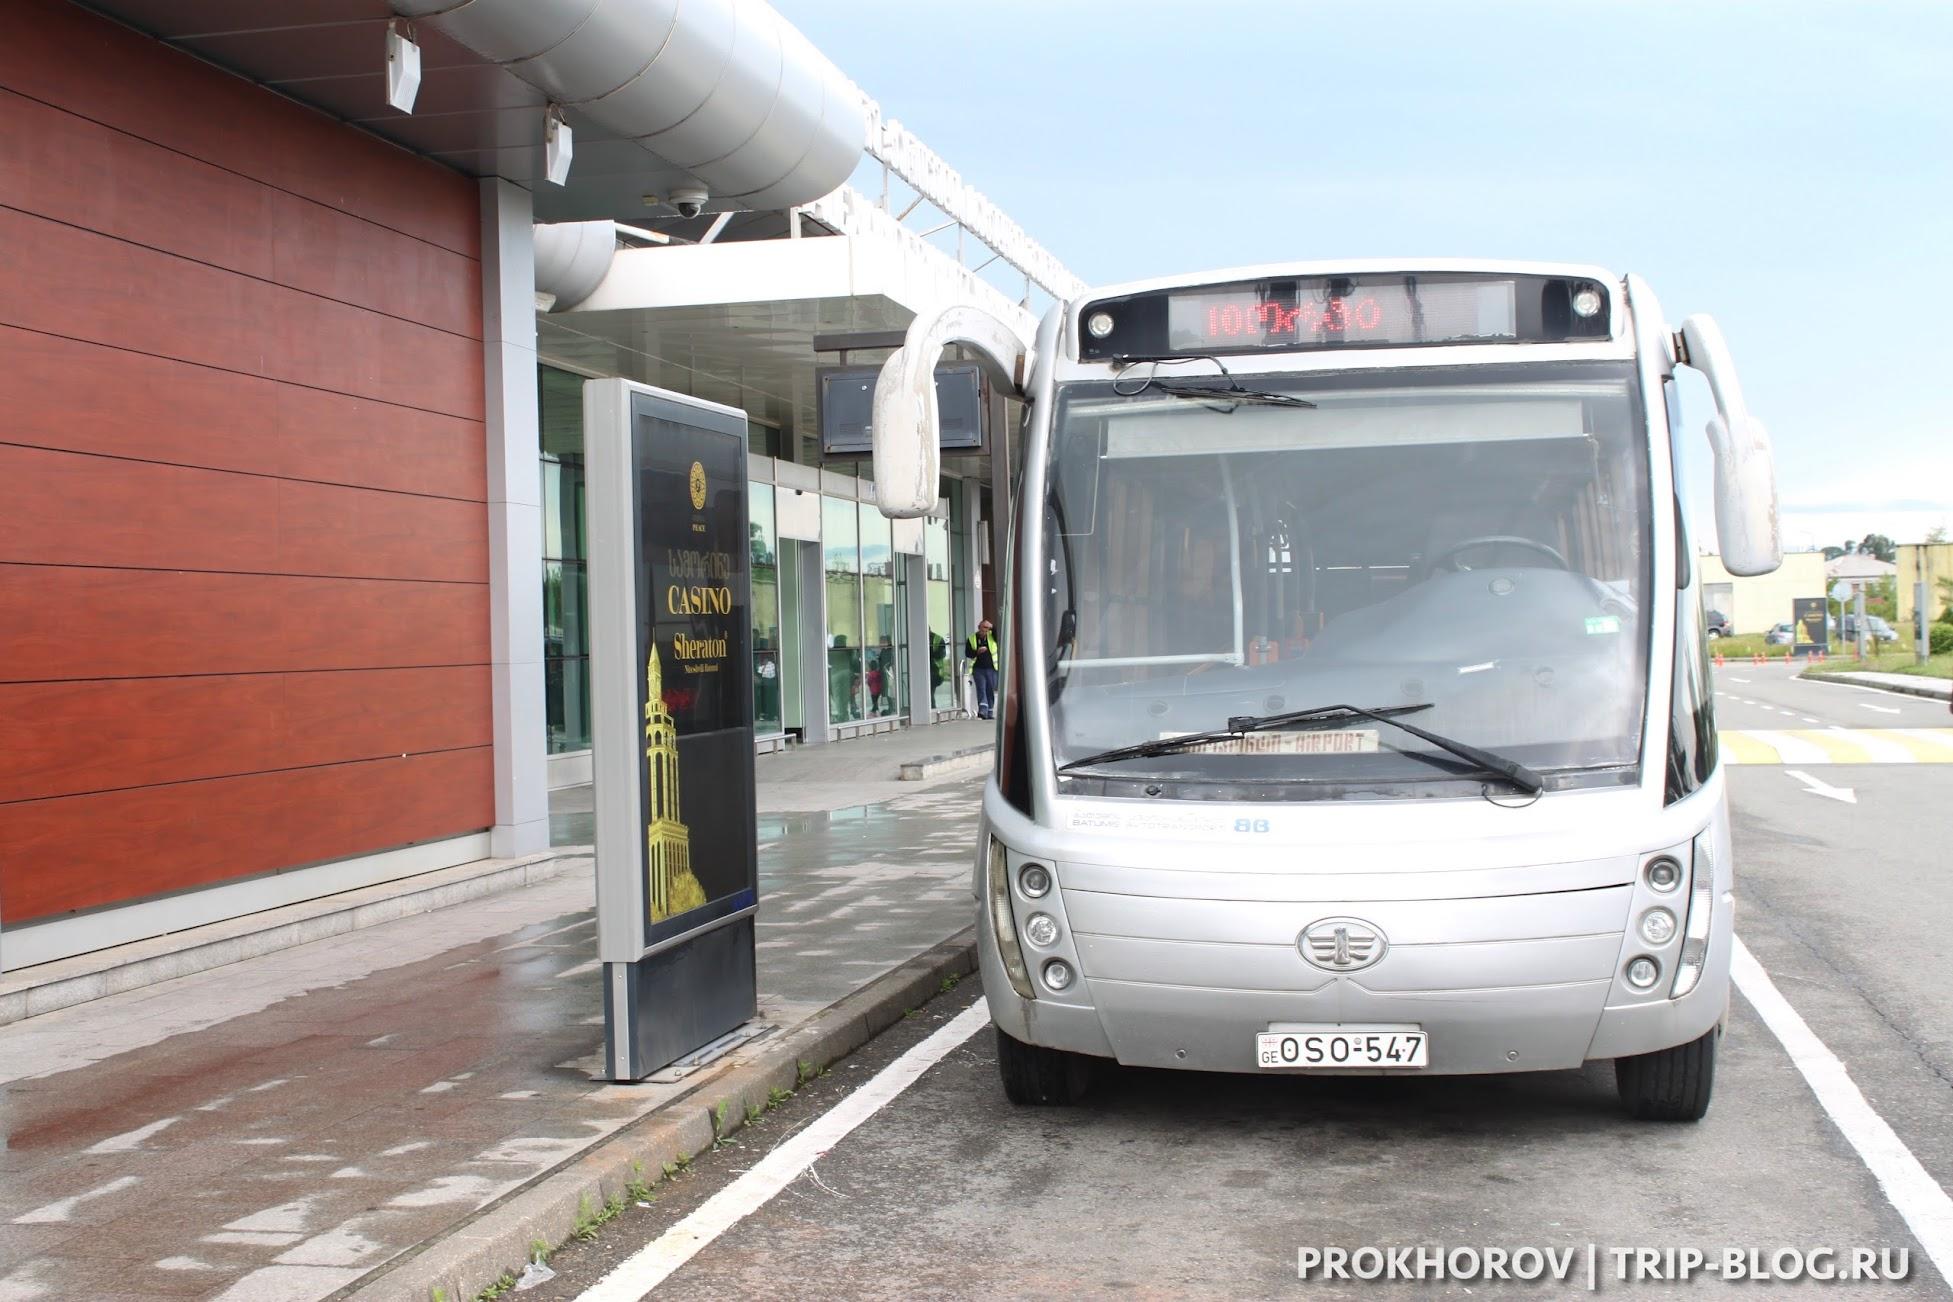 аэропорт батуми автобусы